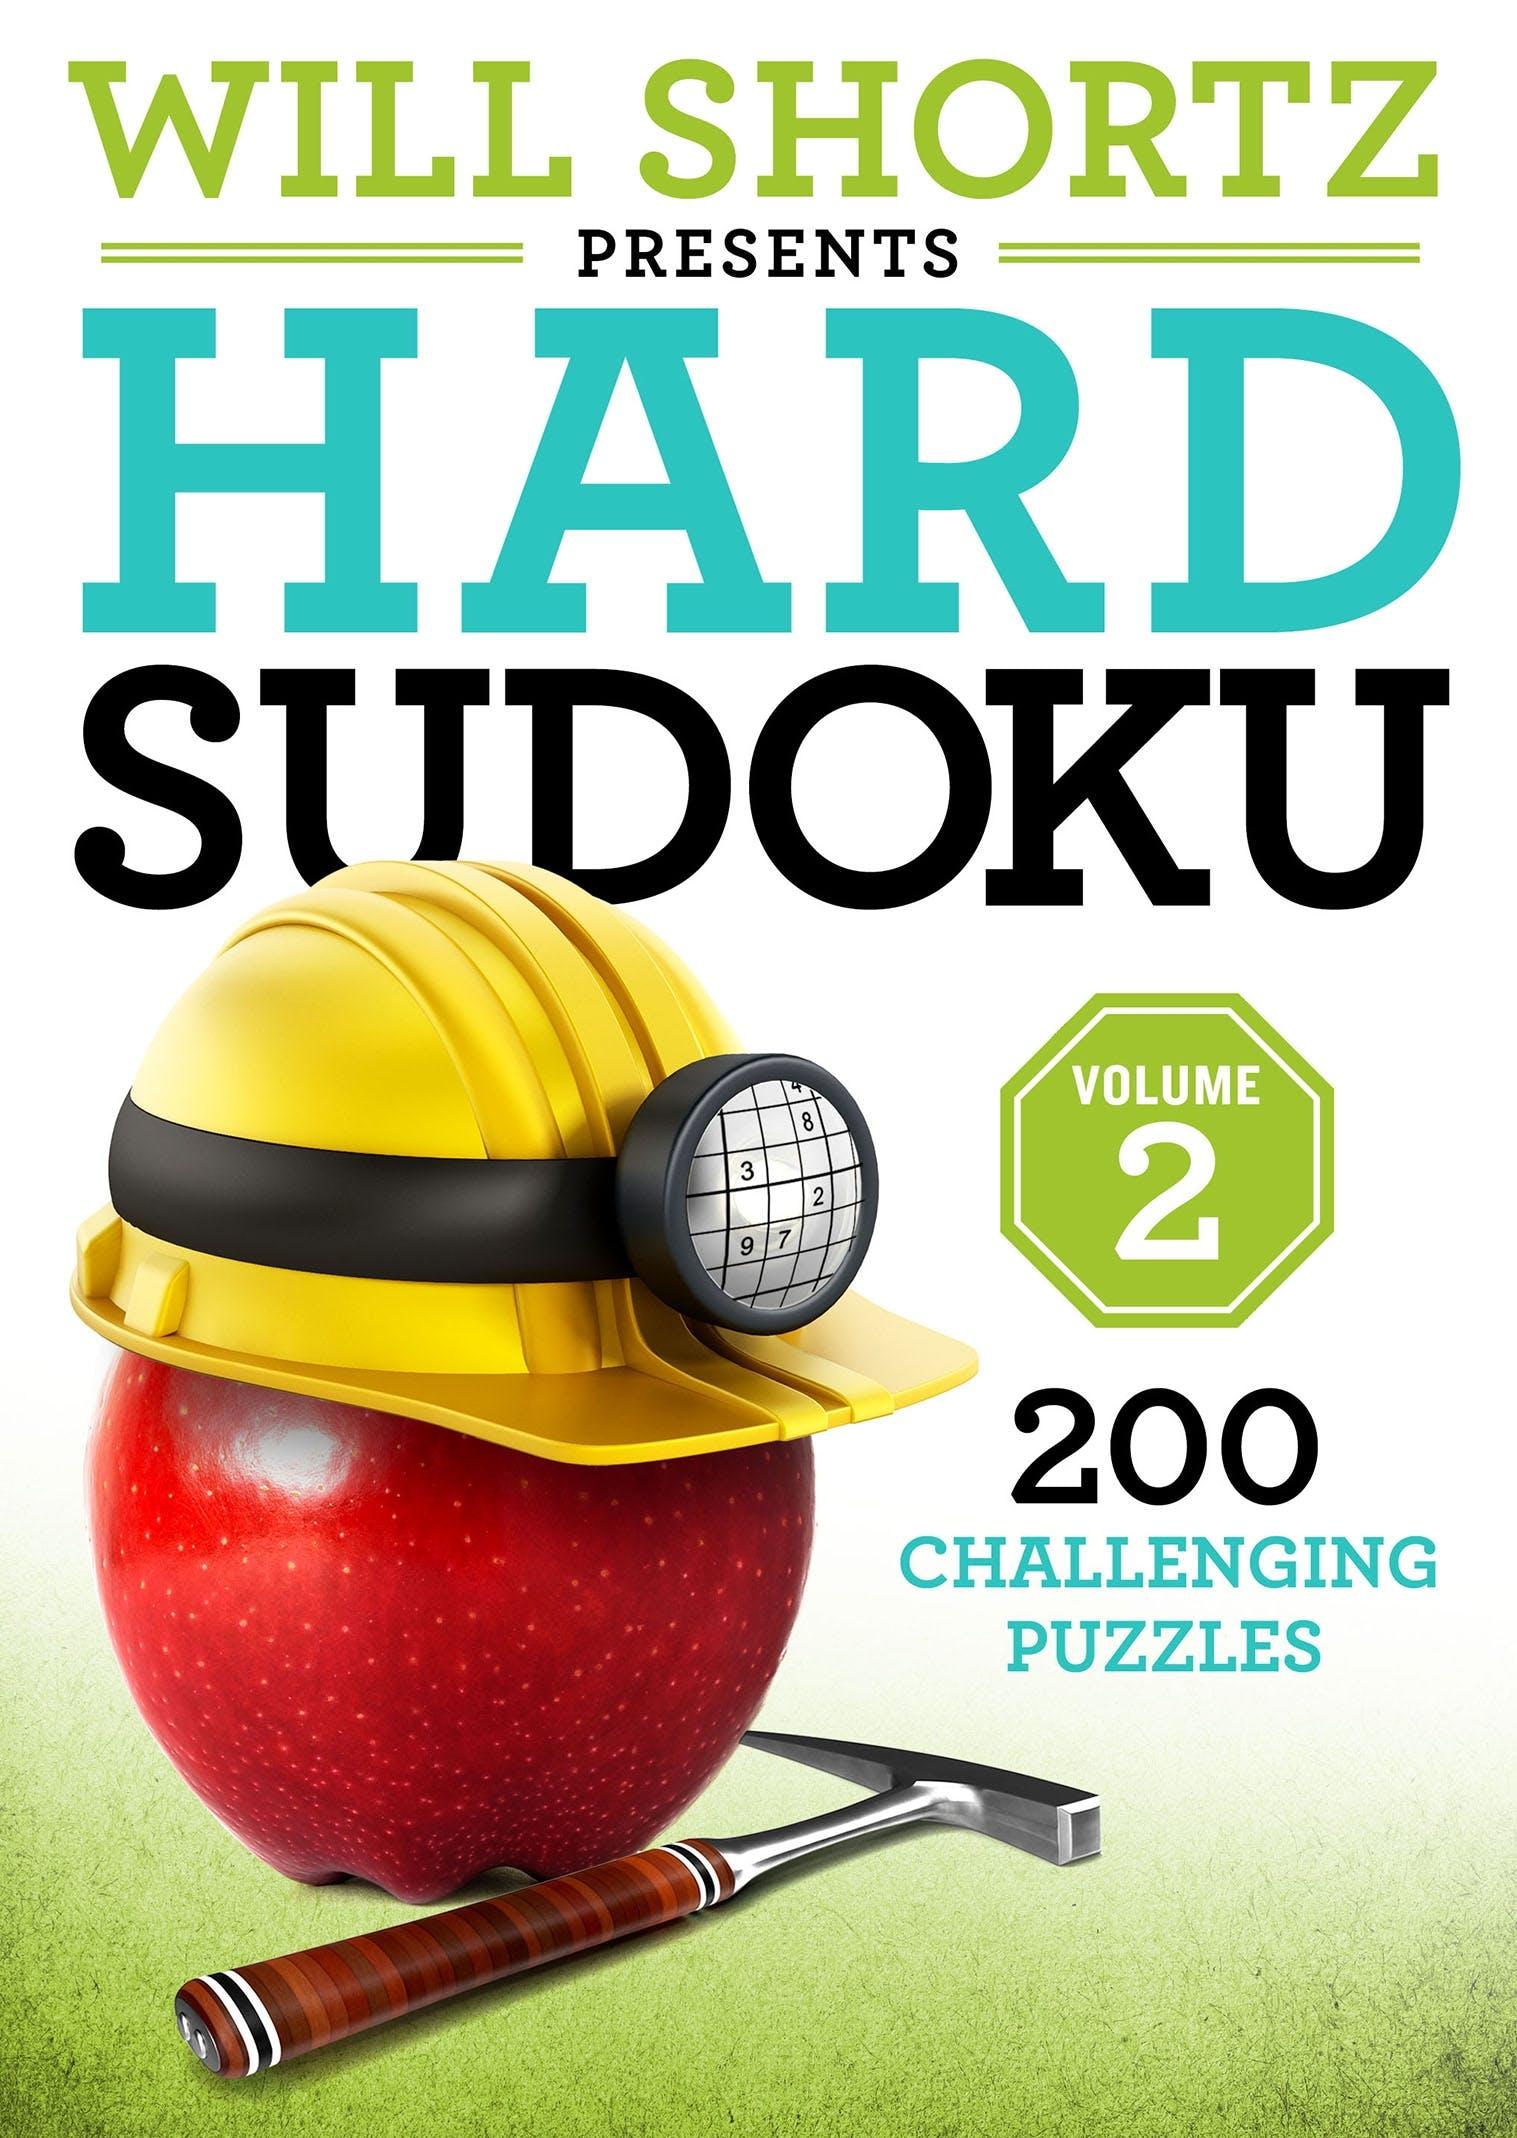 Image of Will Shortz Presents Hard Sudoku Volume 2